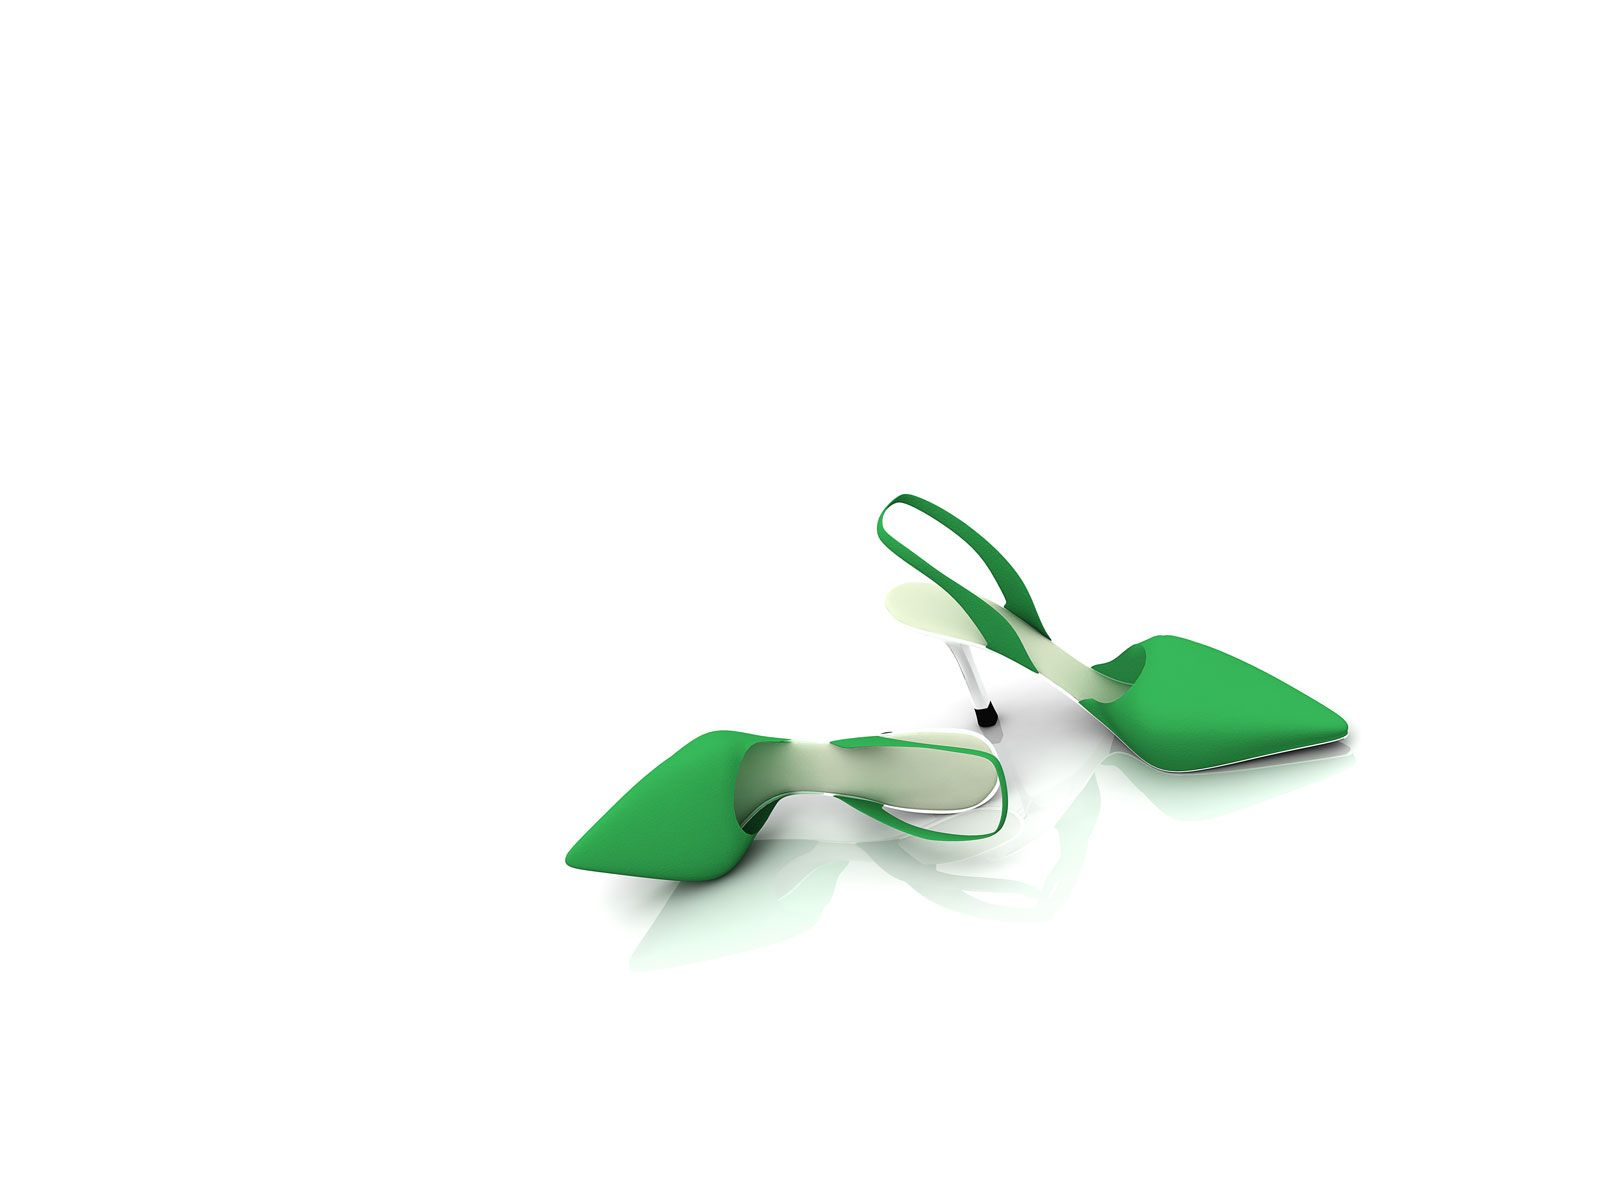 Detalle de imagen de:shoes, keyword, green - 66589